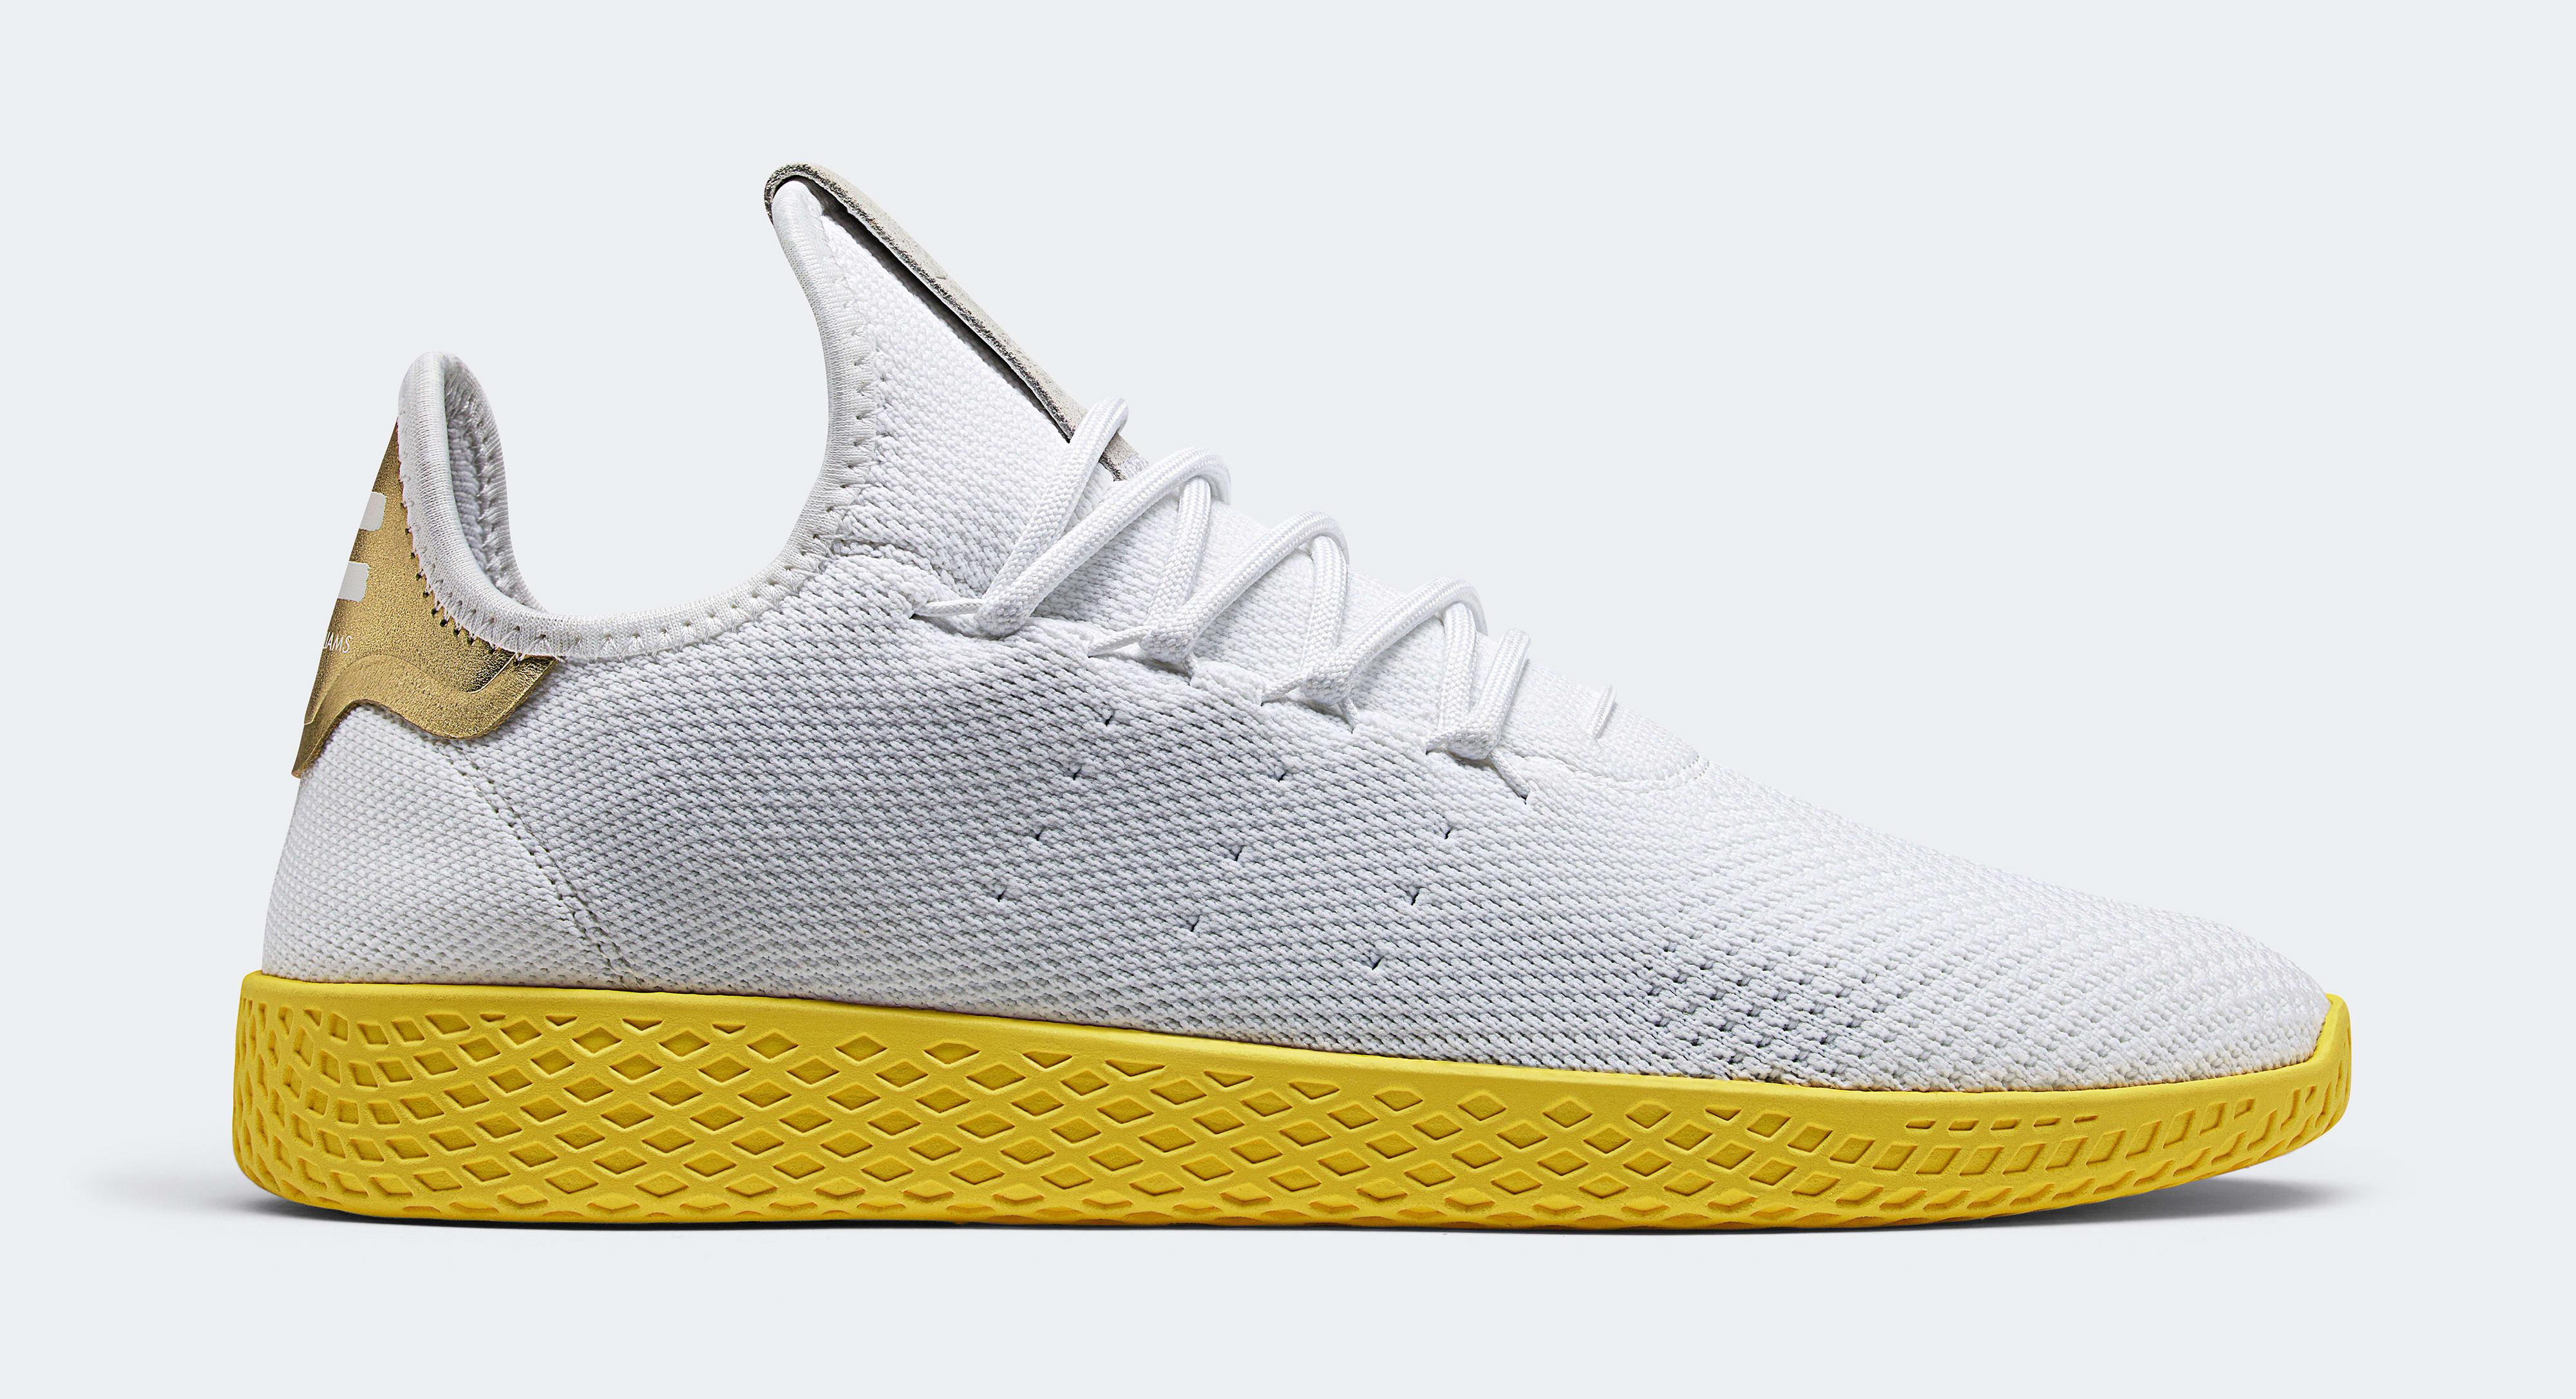 Adidas Pharrell Tennis Shoe